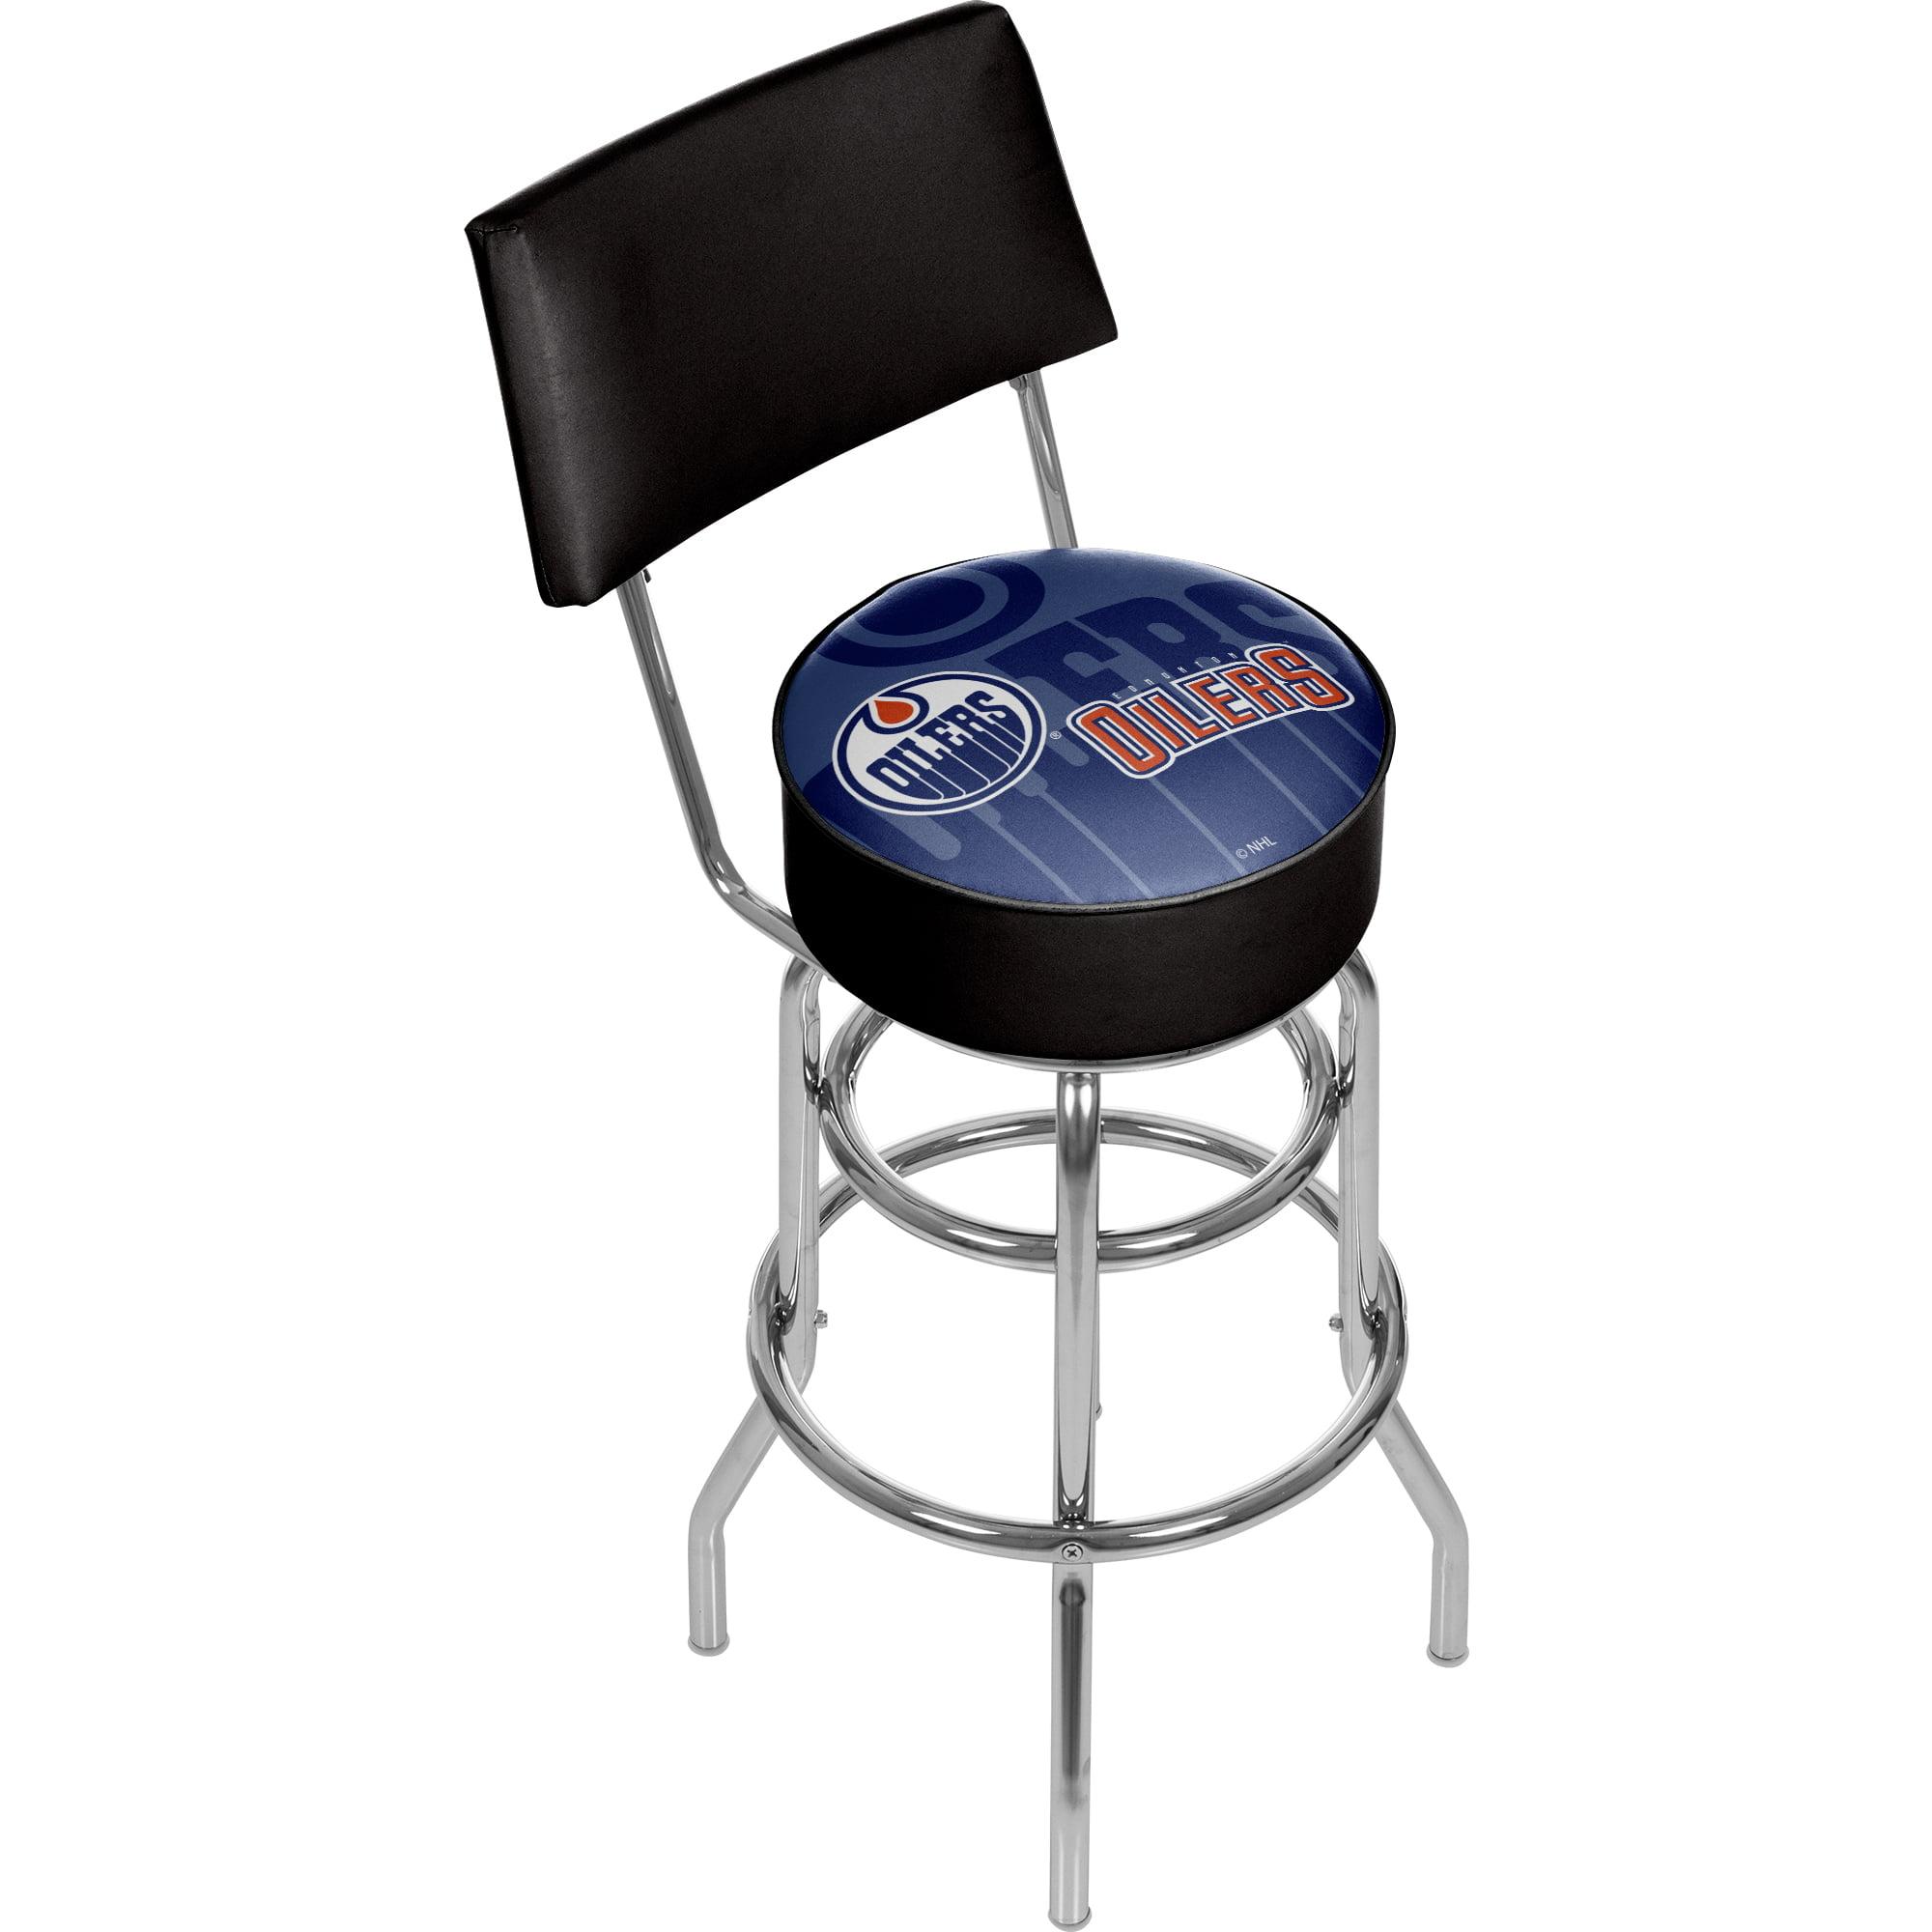 NHL Swivel Bar Stool with Back - Watermark - Edmonton Oilers